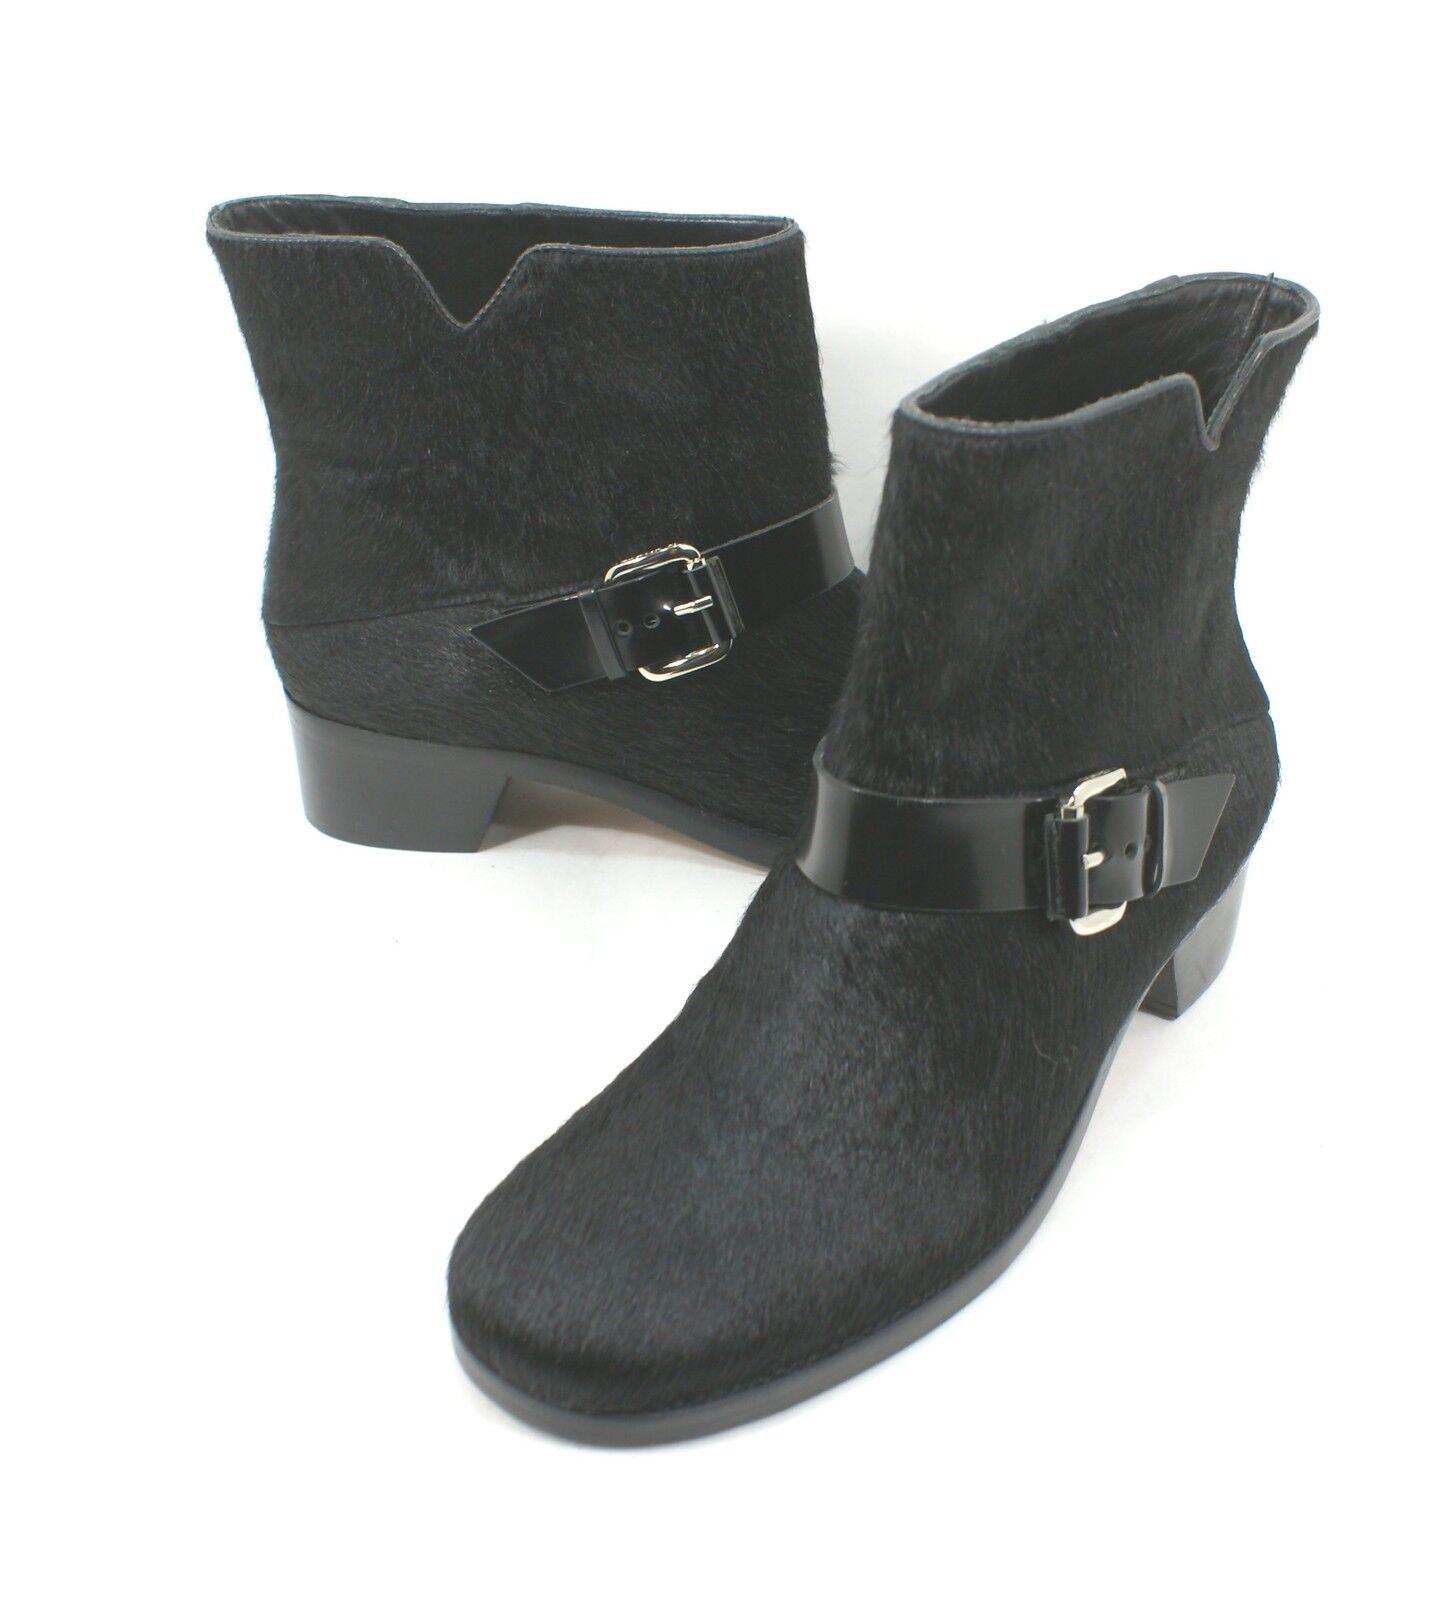 Derek Lam 10 Crosby Charlotte Black Calf Hair Ankle Boot Size 9.5 M